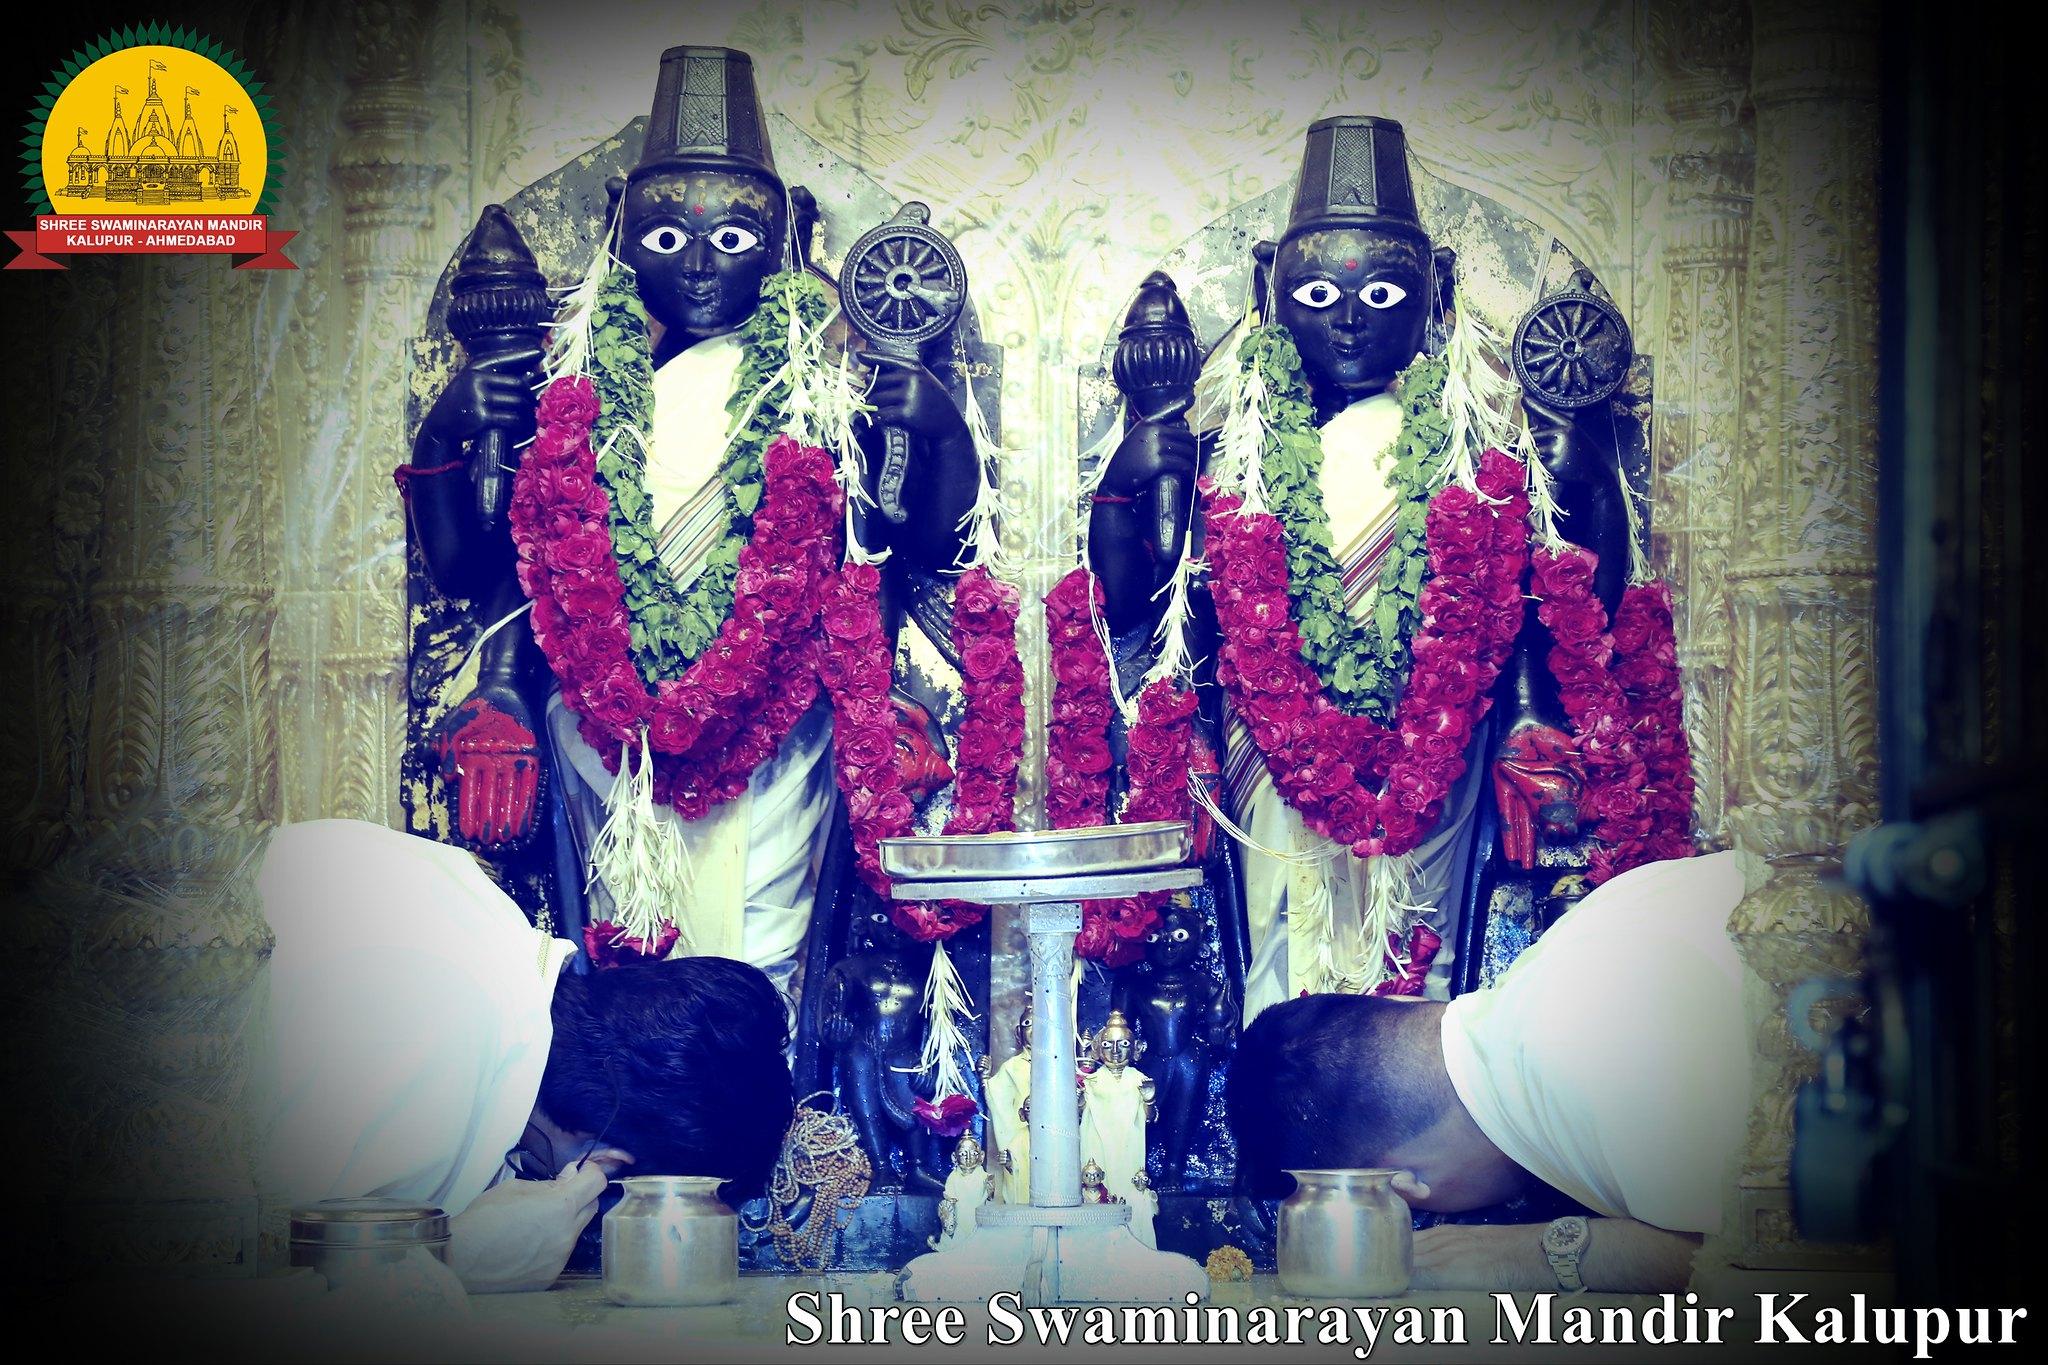 Adhik Maas, NarNarayan Dev Abhishek - Kalupur